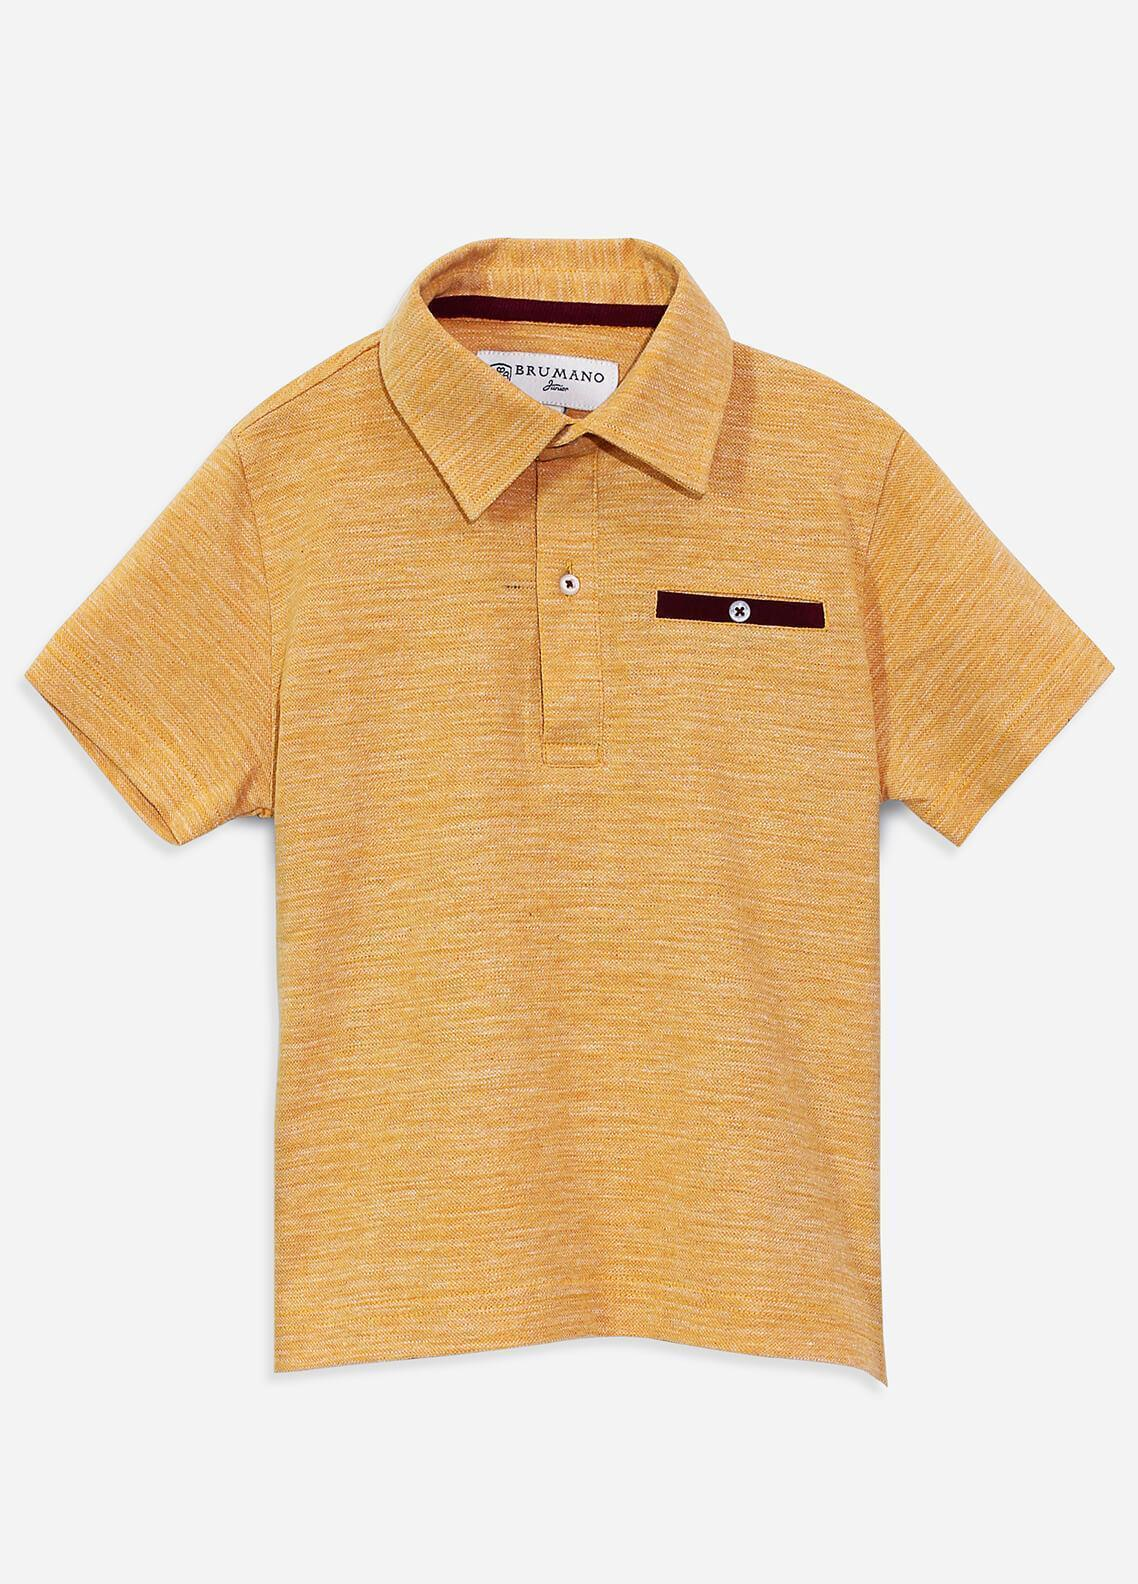 Brumano Cotton Polo Shirts for Boys - Mustard BRM-090